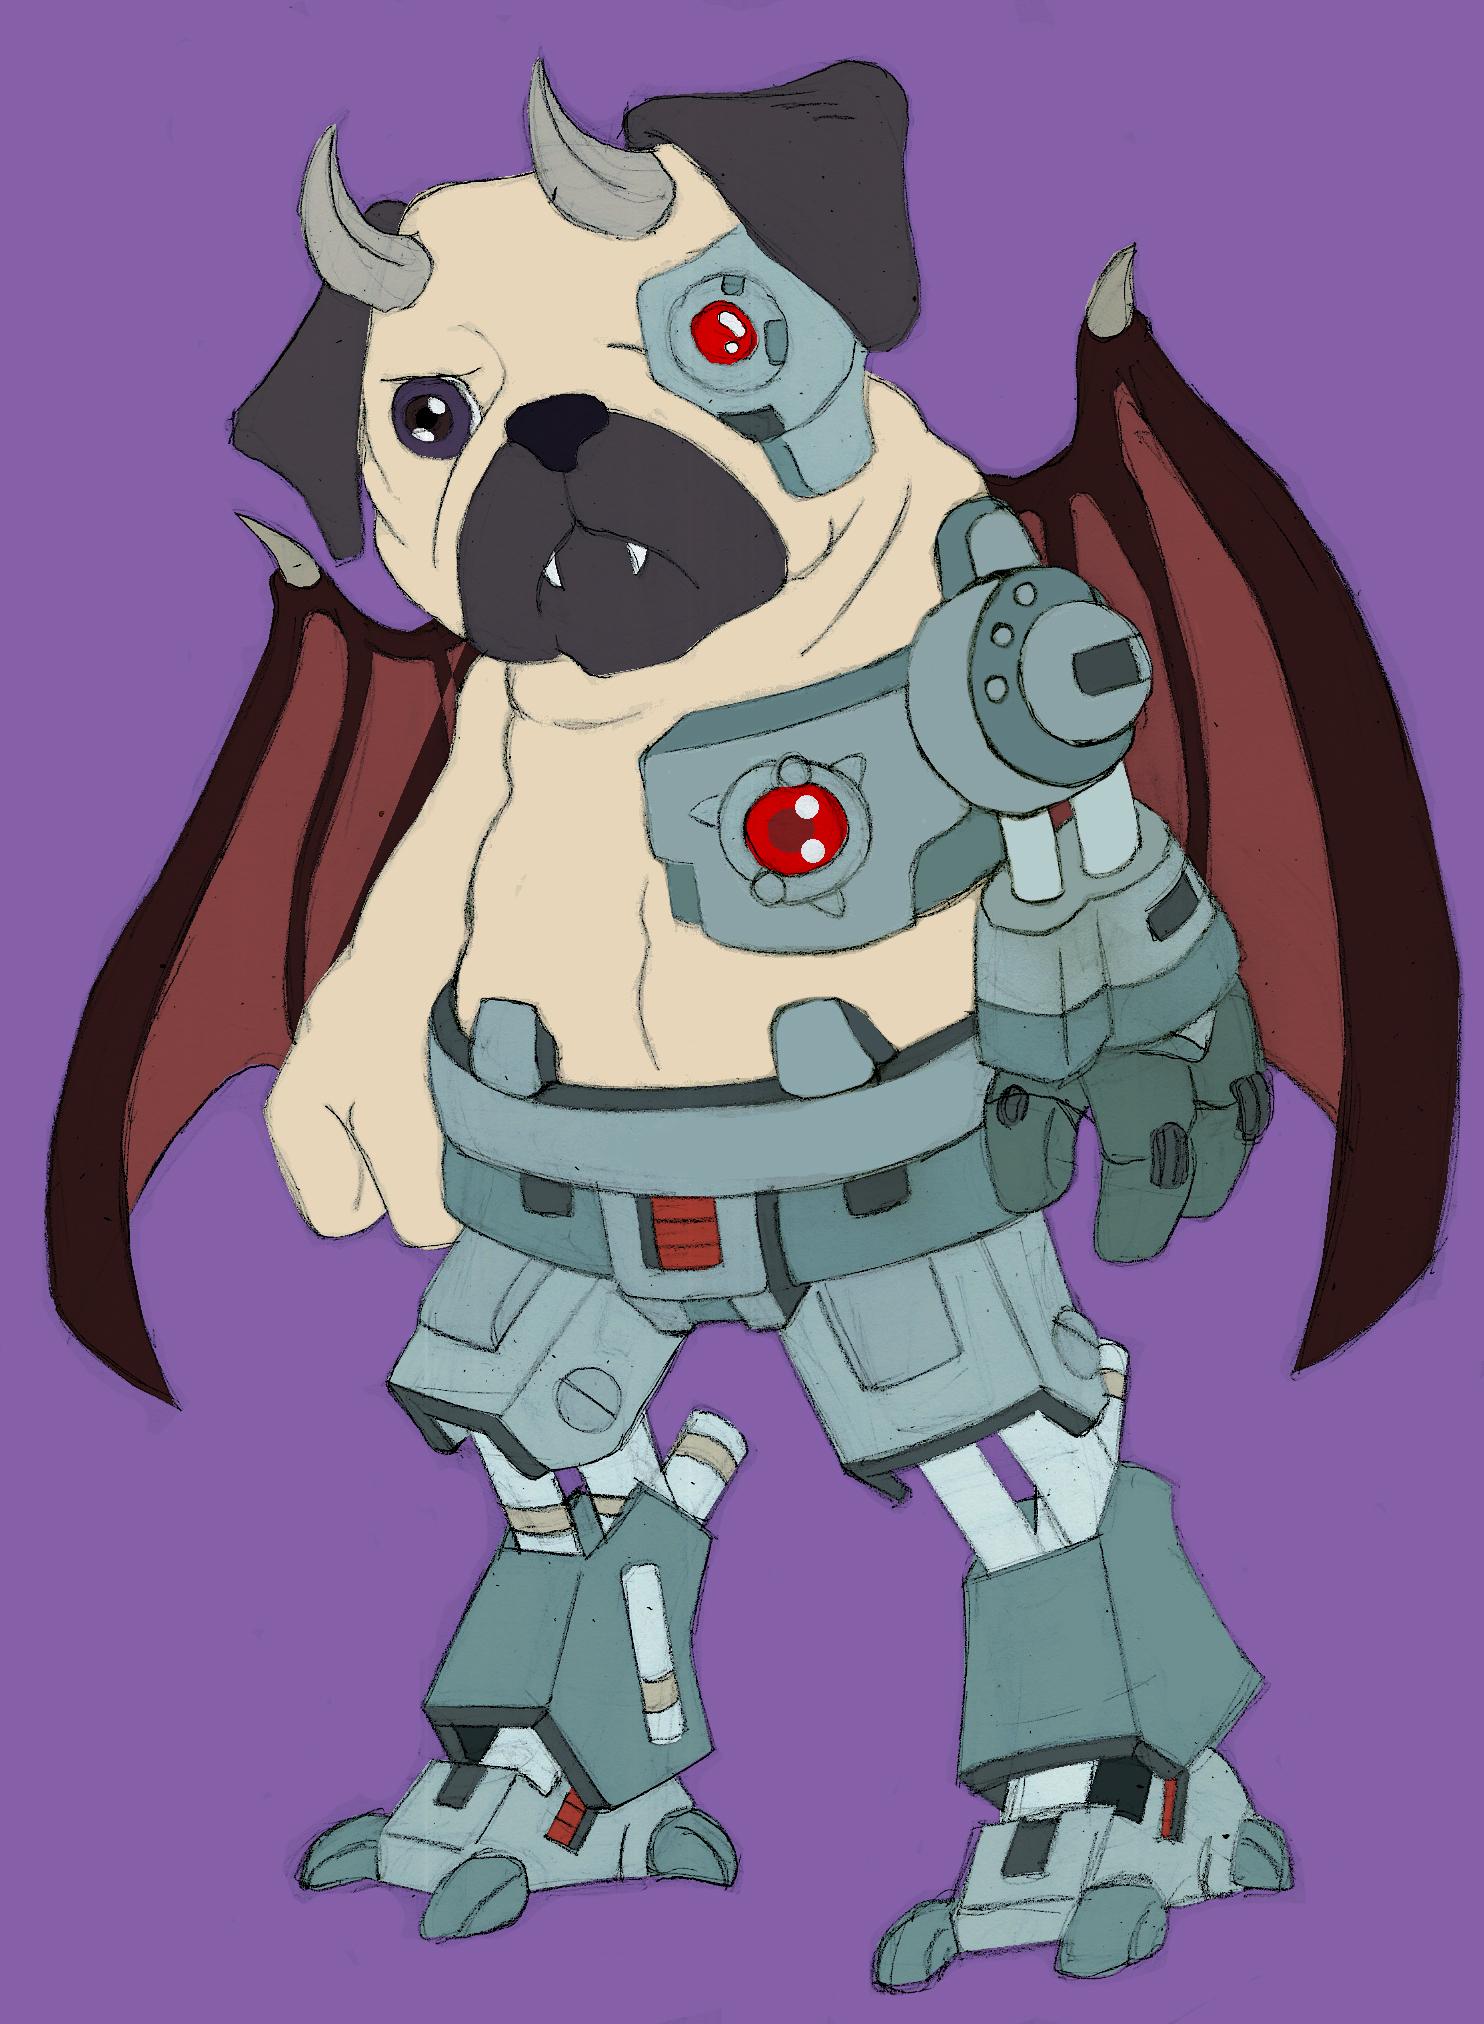 Demonic Pug of Black Chaos - Sketch